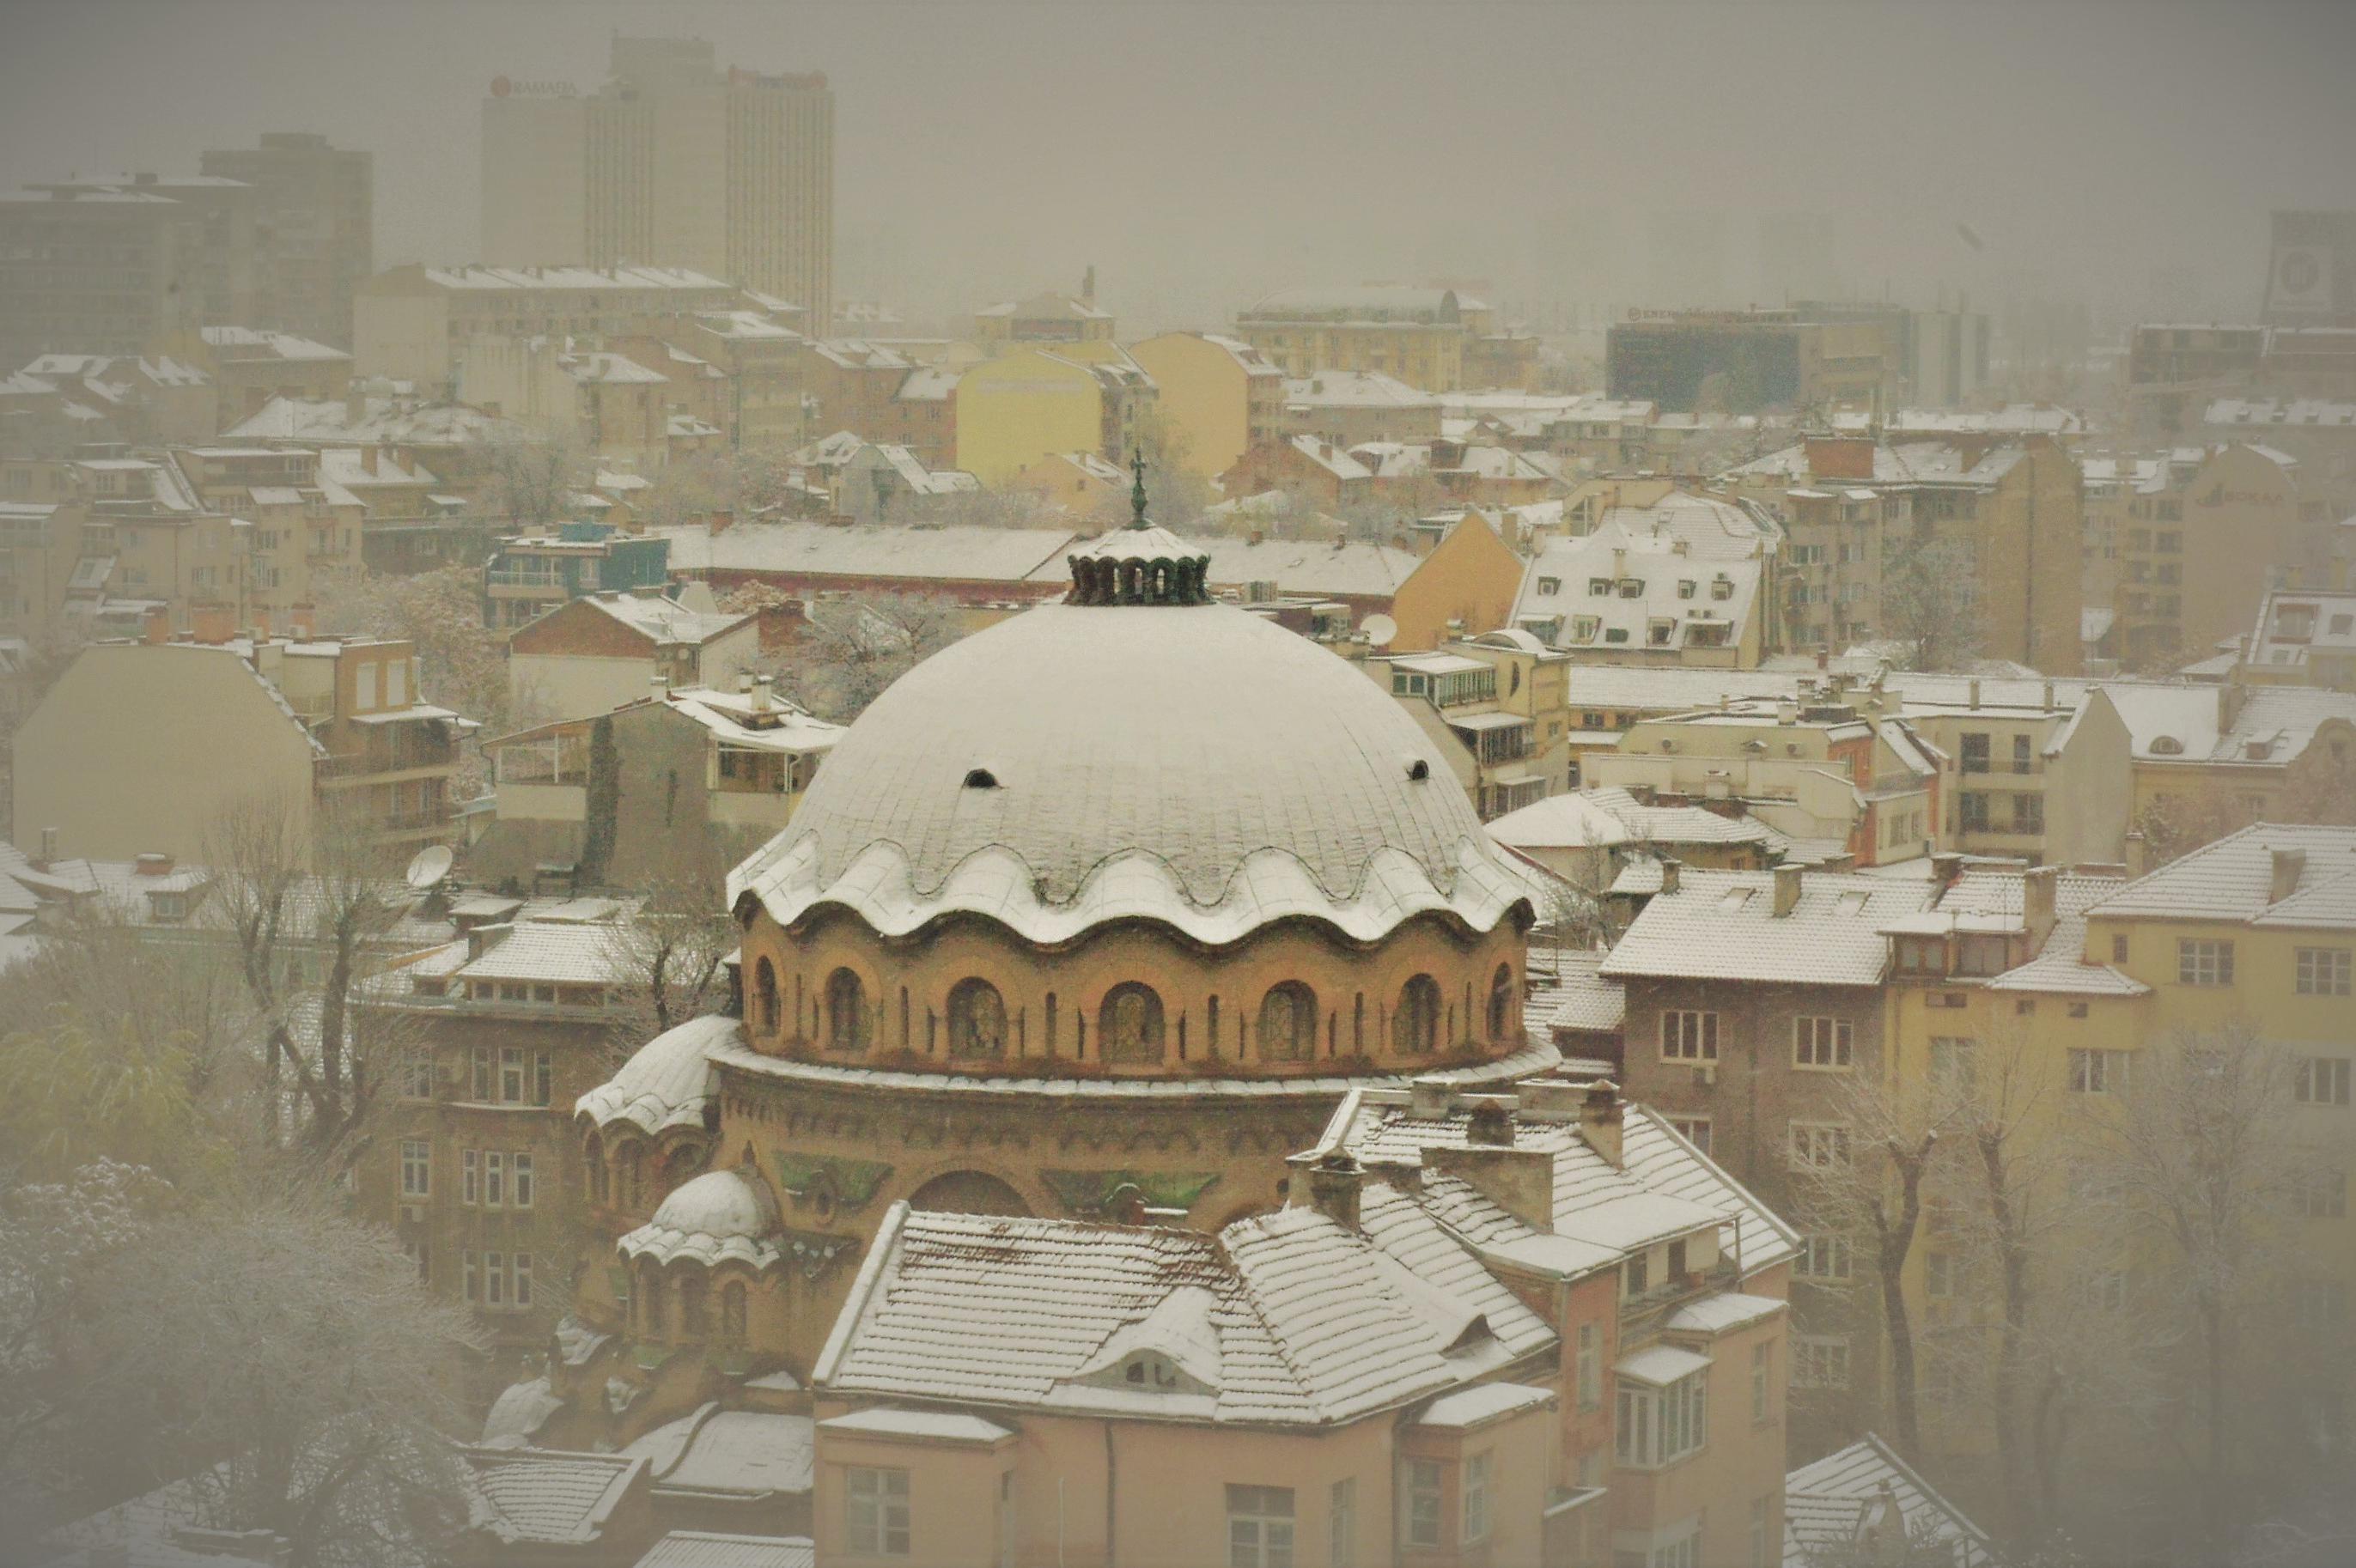 Сняг в София1 4 януари 2019 г.